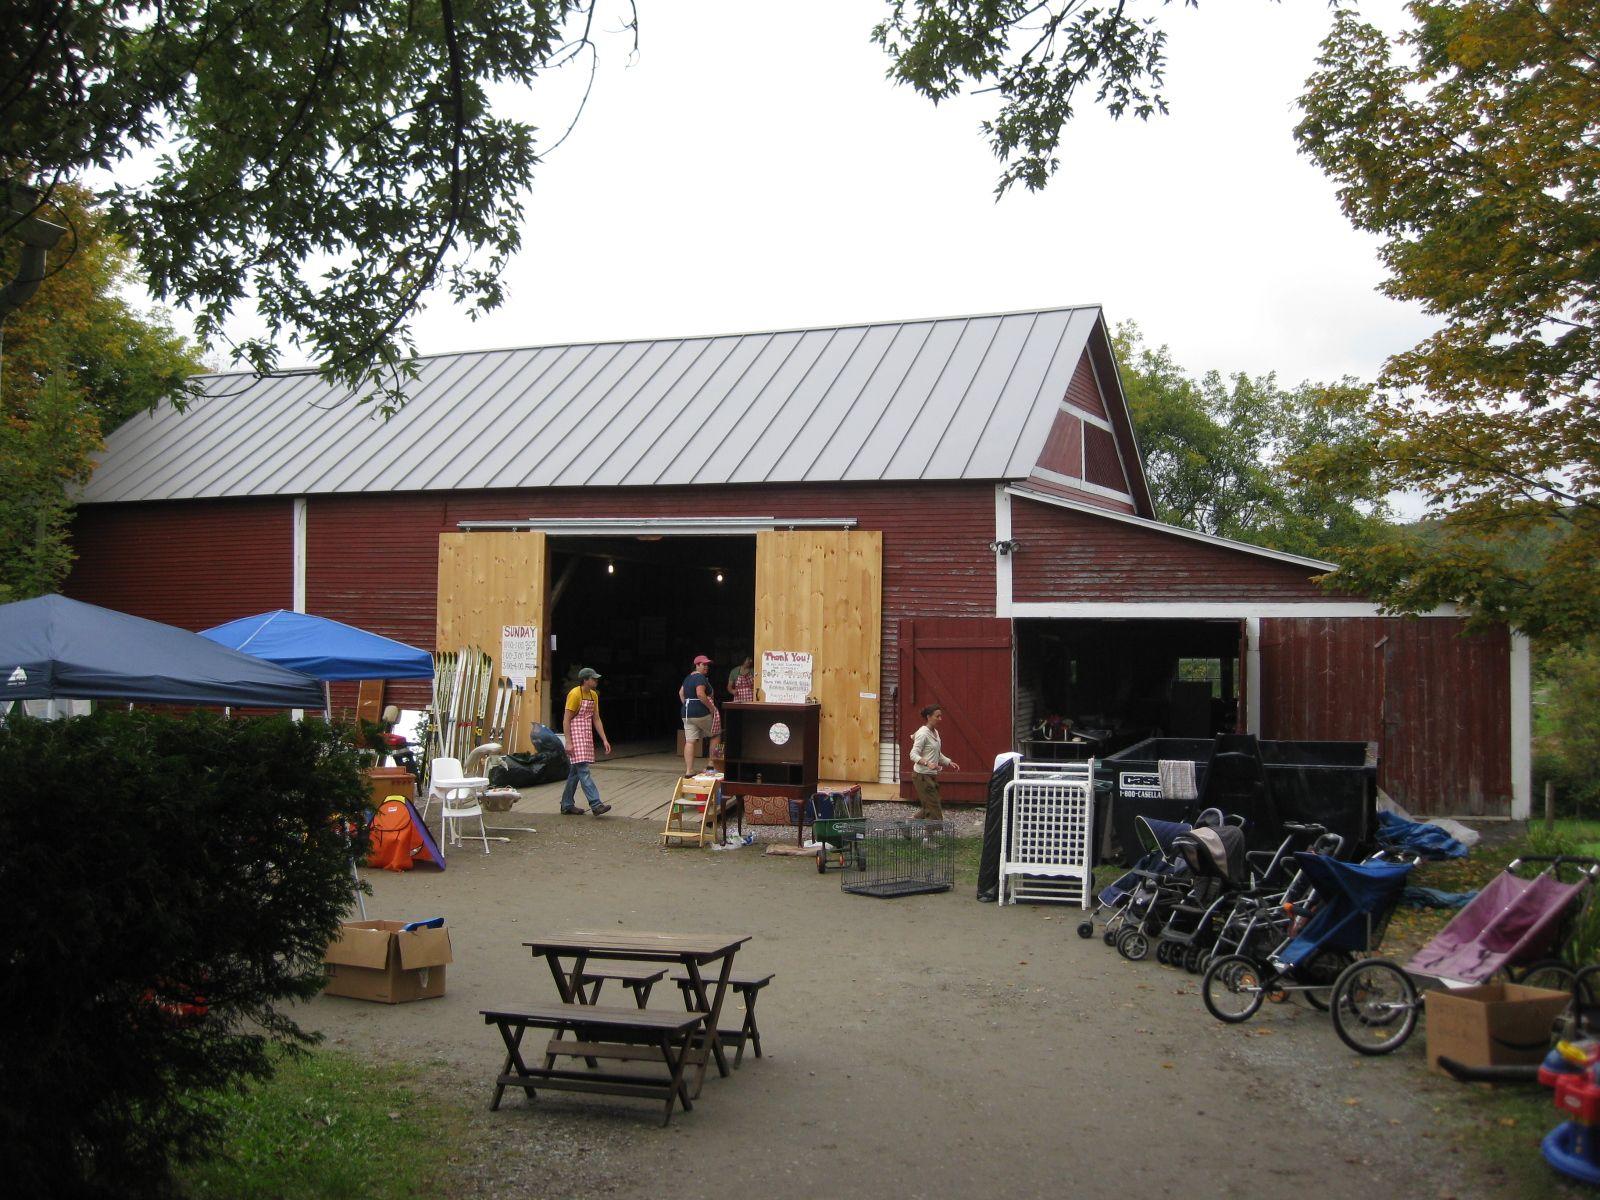 Yard Sale At Underhill Vt Harvest Festival Haunted